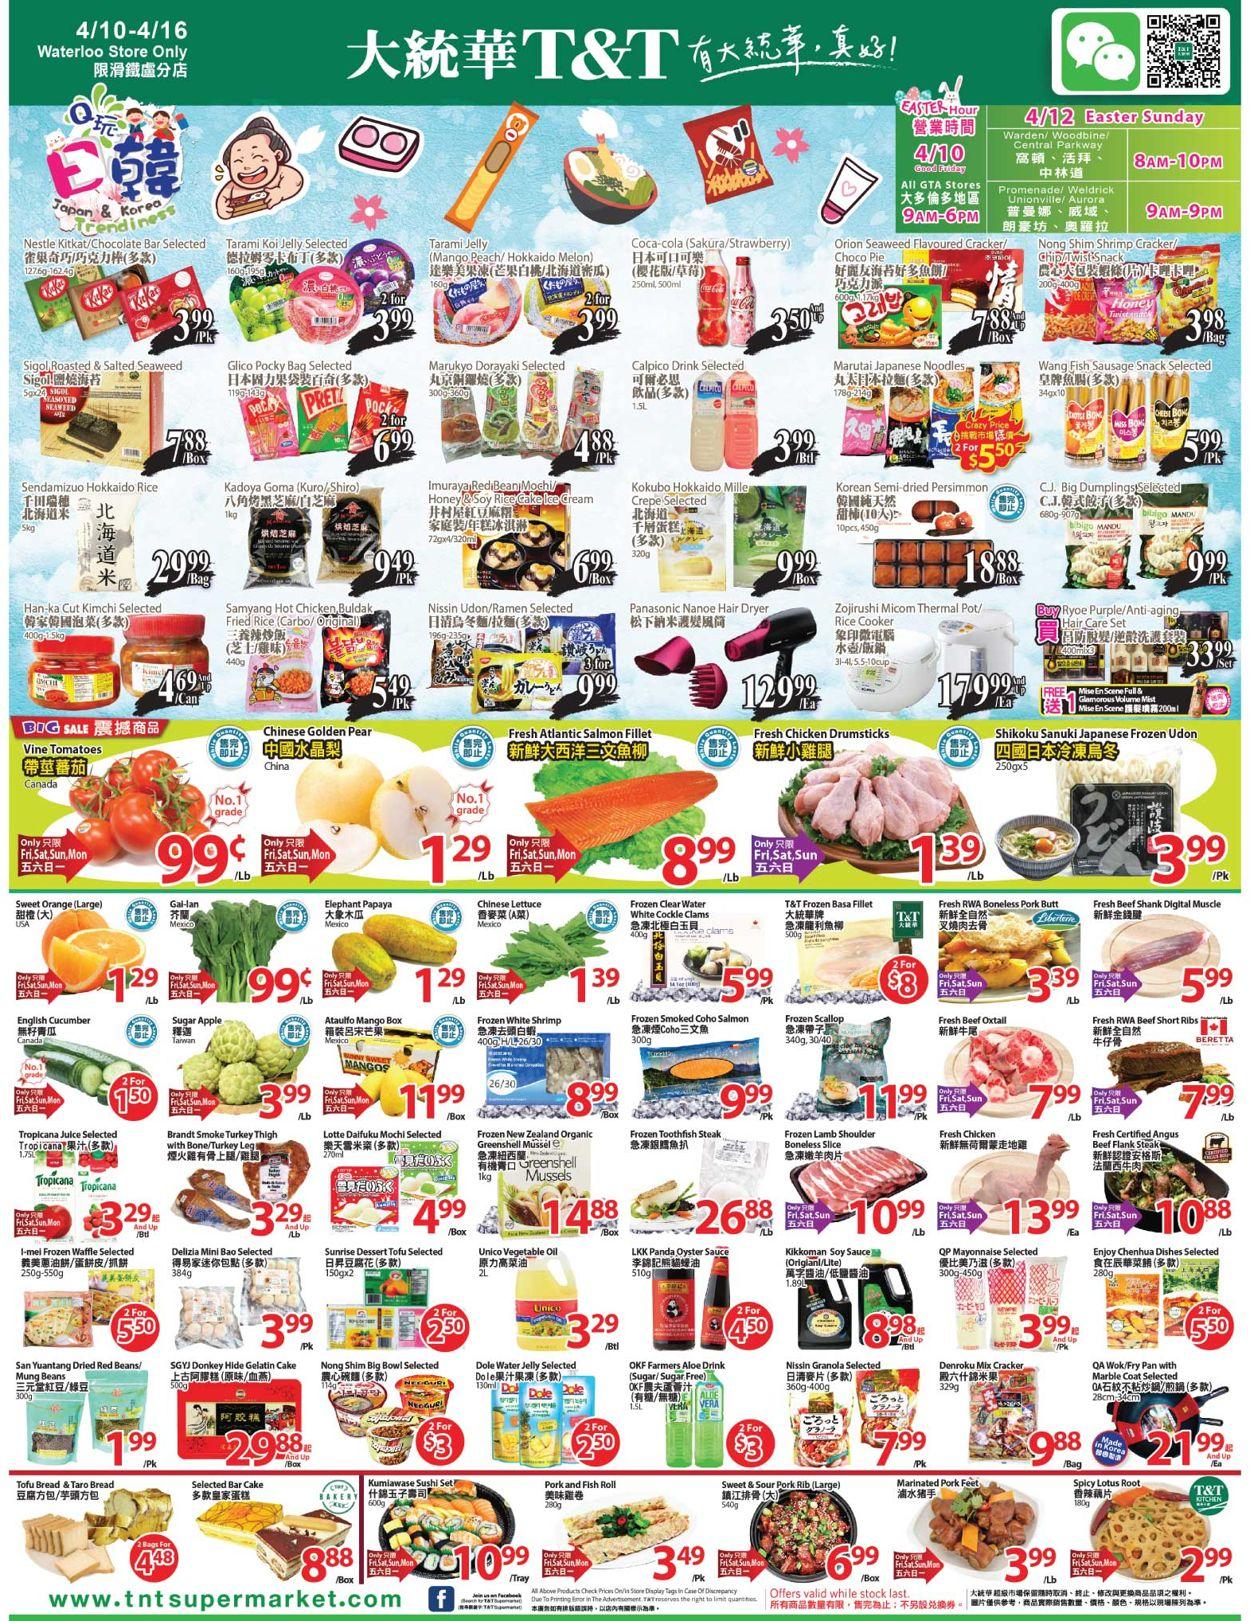 T&T Supermarket Flyer - 04/10-04/16/2020